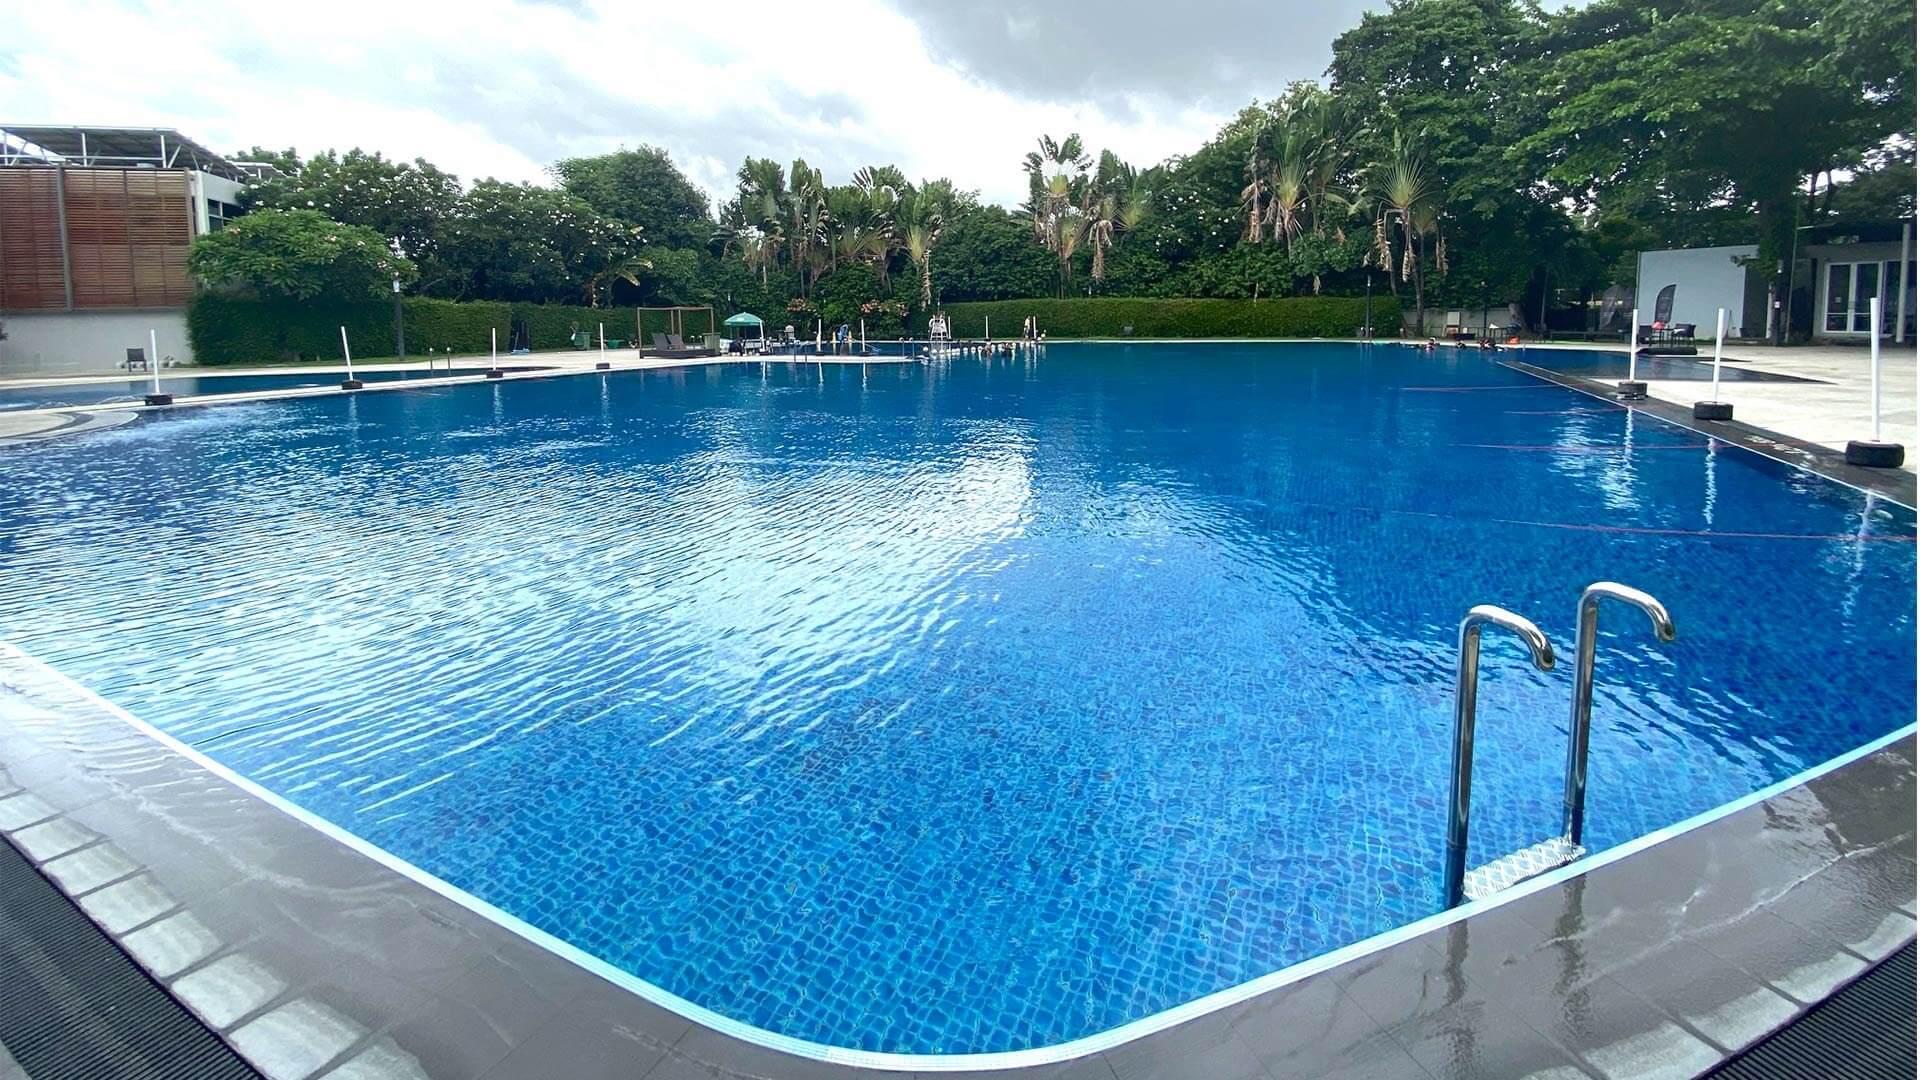 PADI Open Water Course In Bangkok